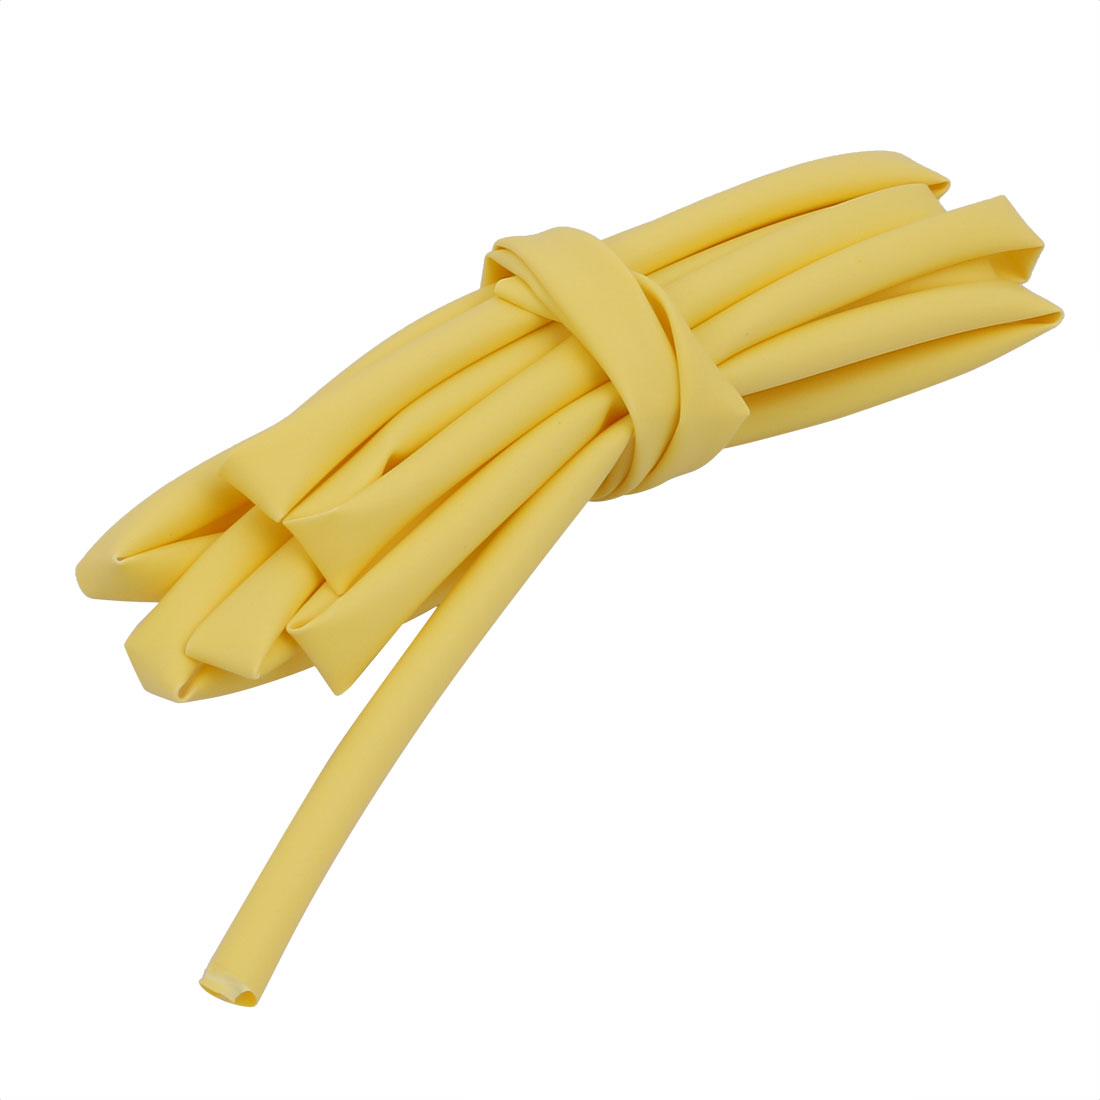 2M 0.2in Inner Dia Polyolefin Flame Retardant Tube Yellow for Wire Repairing